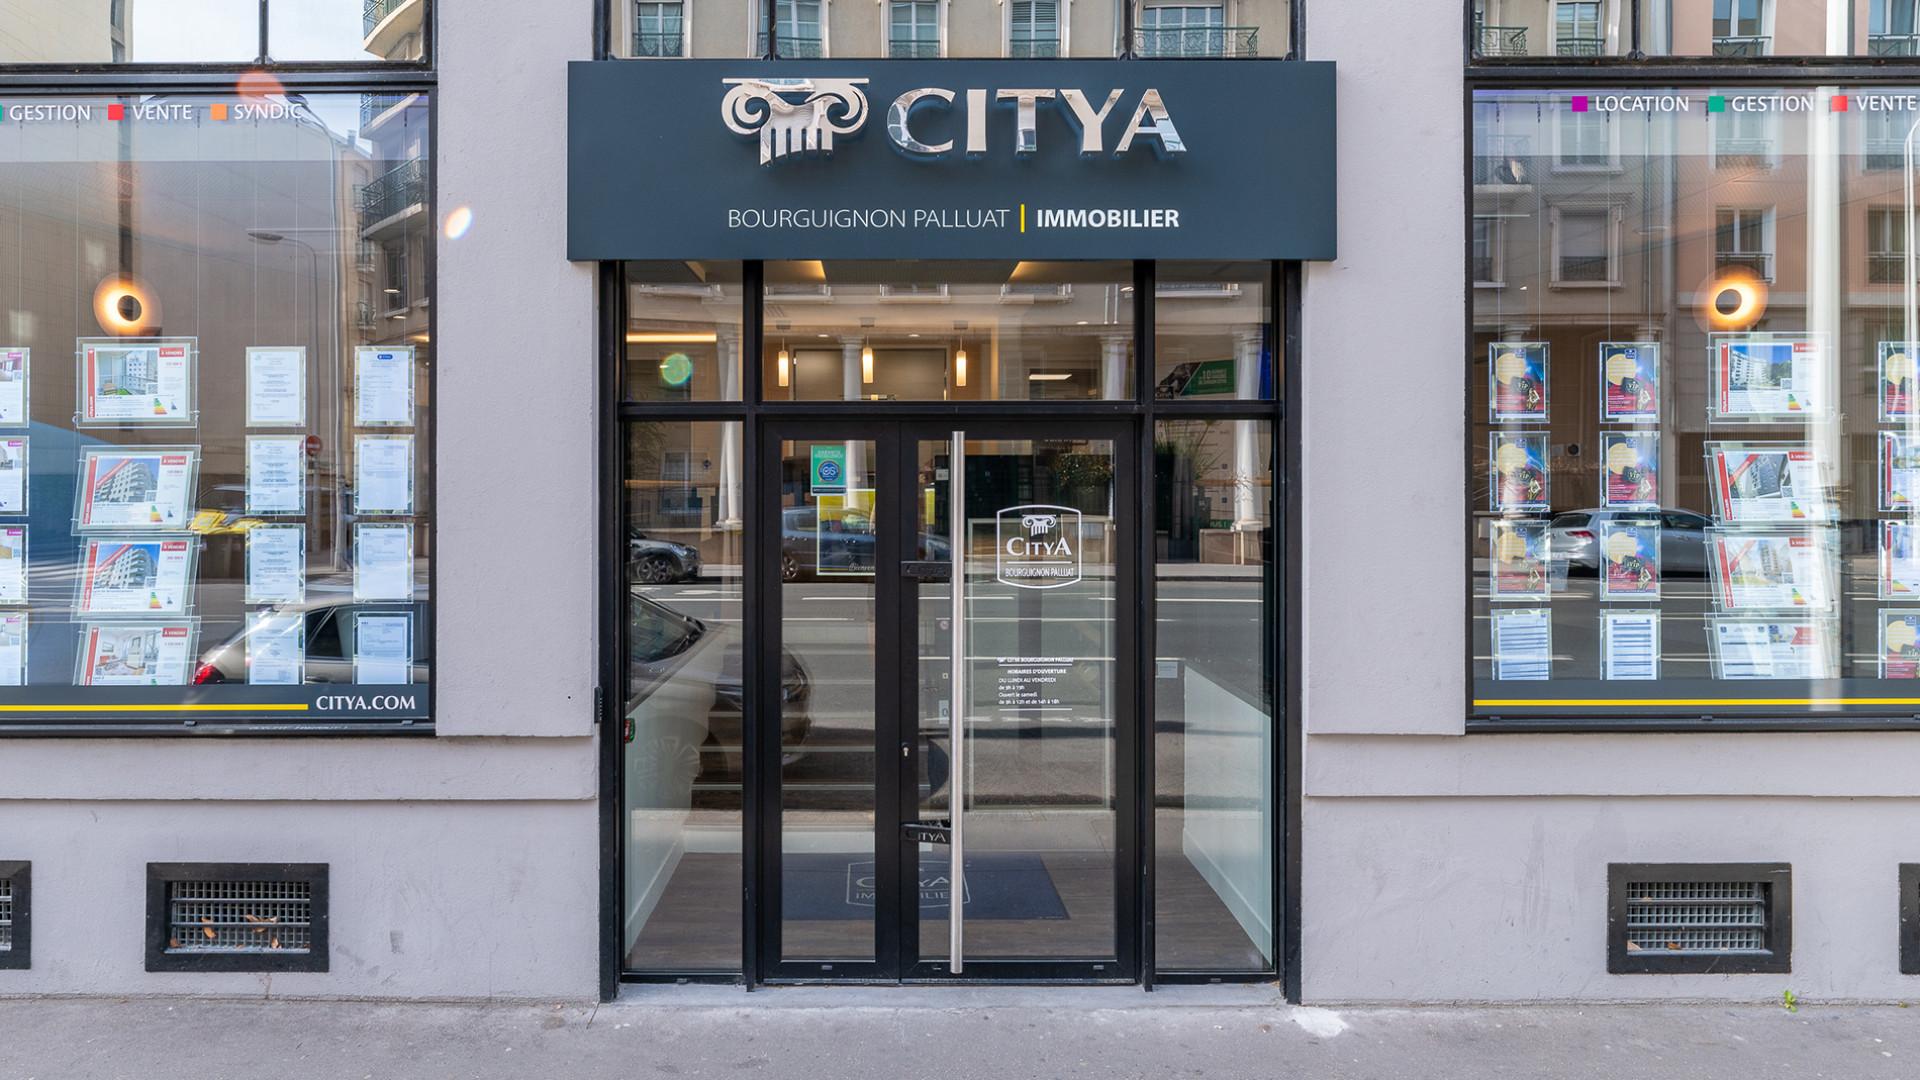 Agence immo Citya Bourguignon Palluat